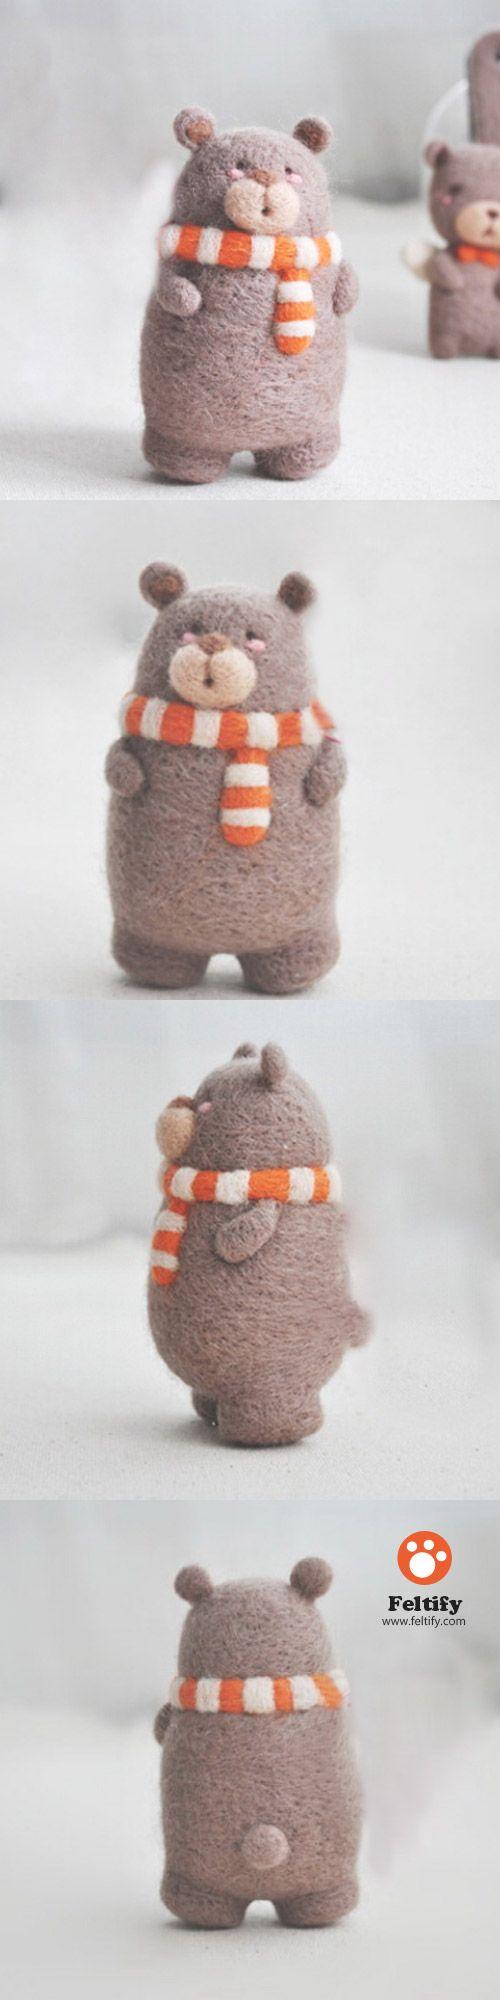 Handmade needle felted felting cute animal project bear with scarf felt doll